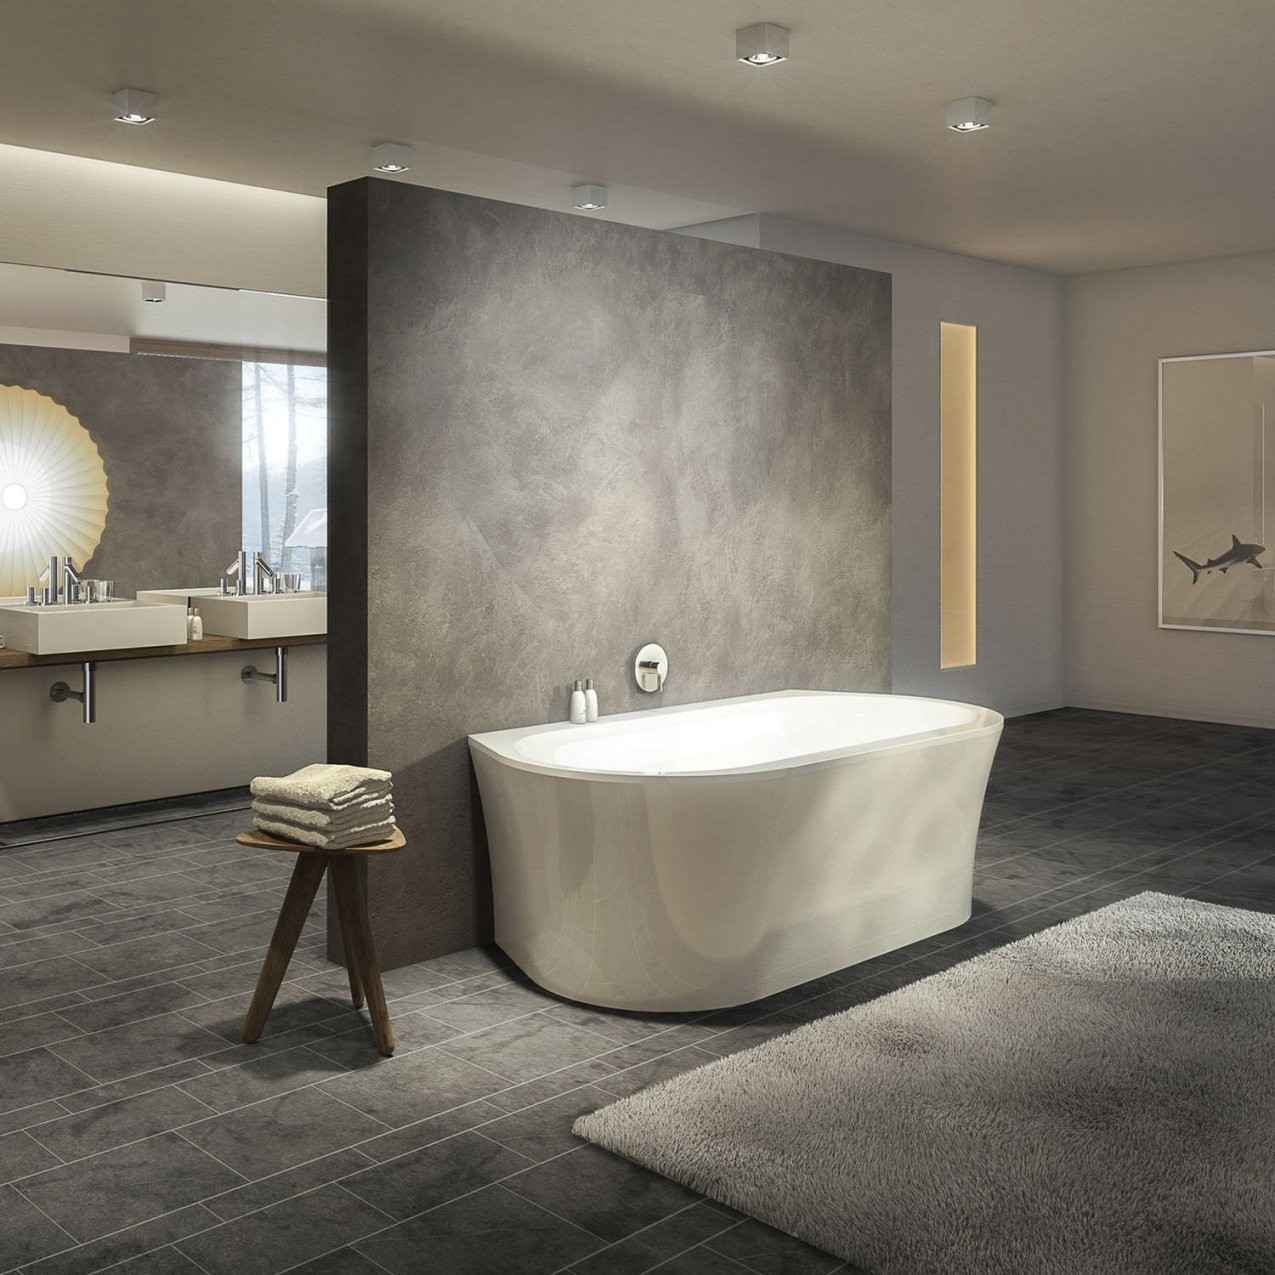 Freistehende Badewanne  Oval  Aus Acryl  Primeline Wall von Ovale Badewanne Freistehend Bild